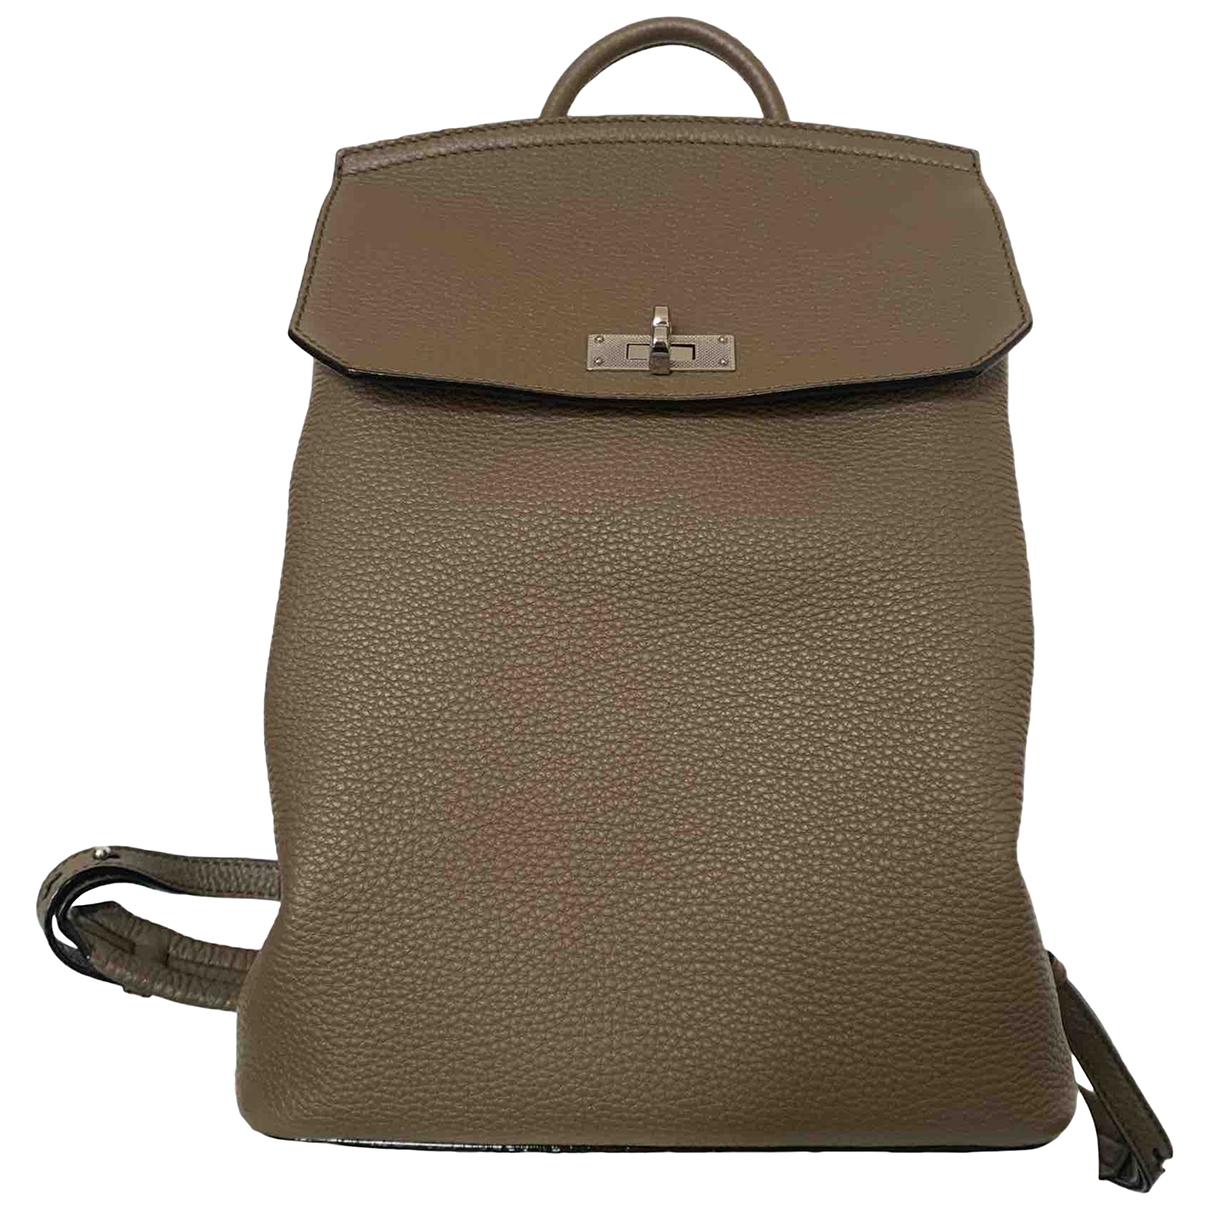 Bally \N Beige Leather backpack for Women \N